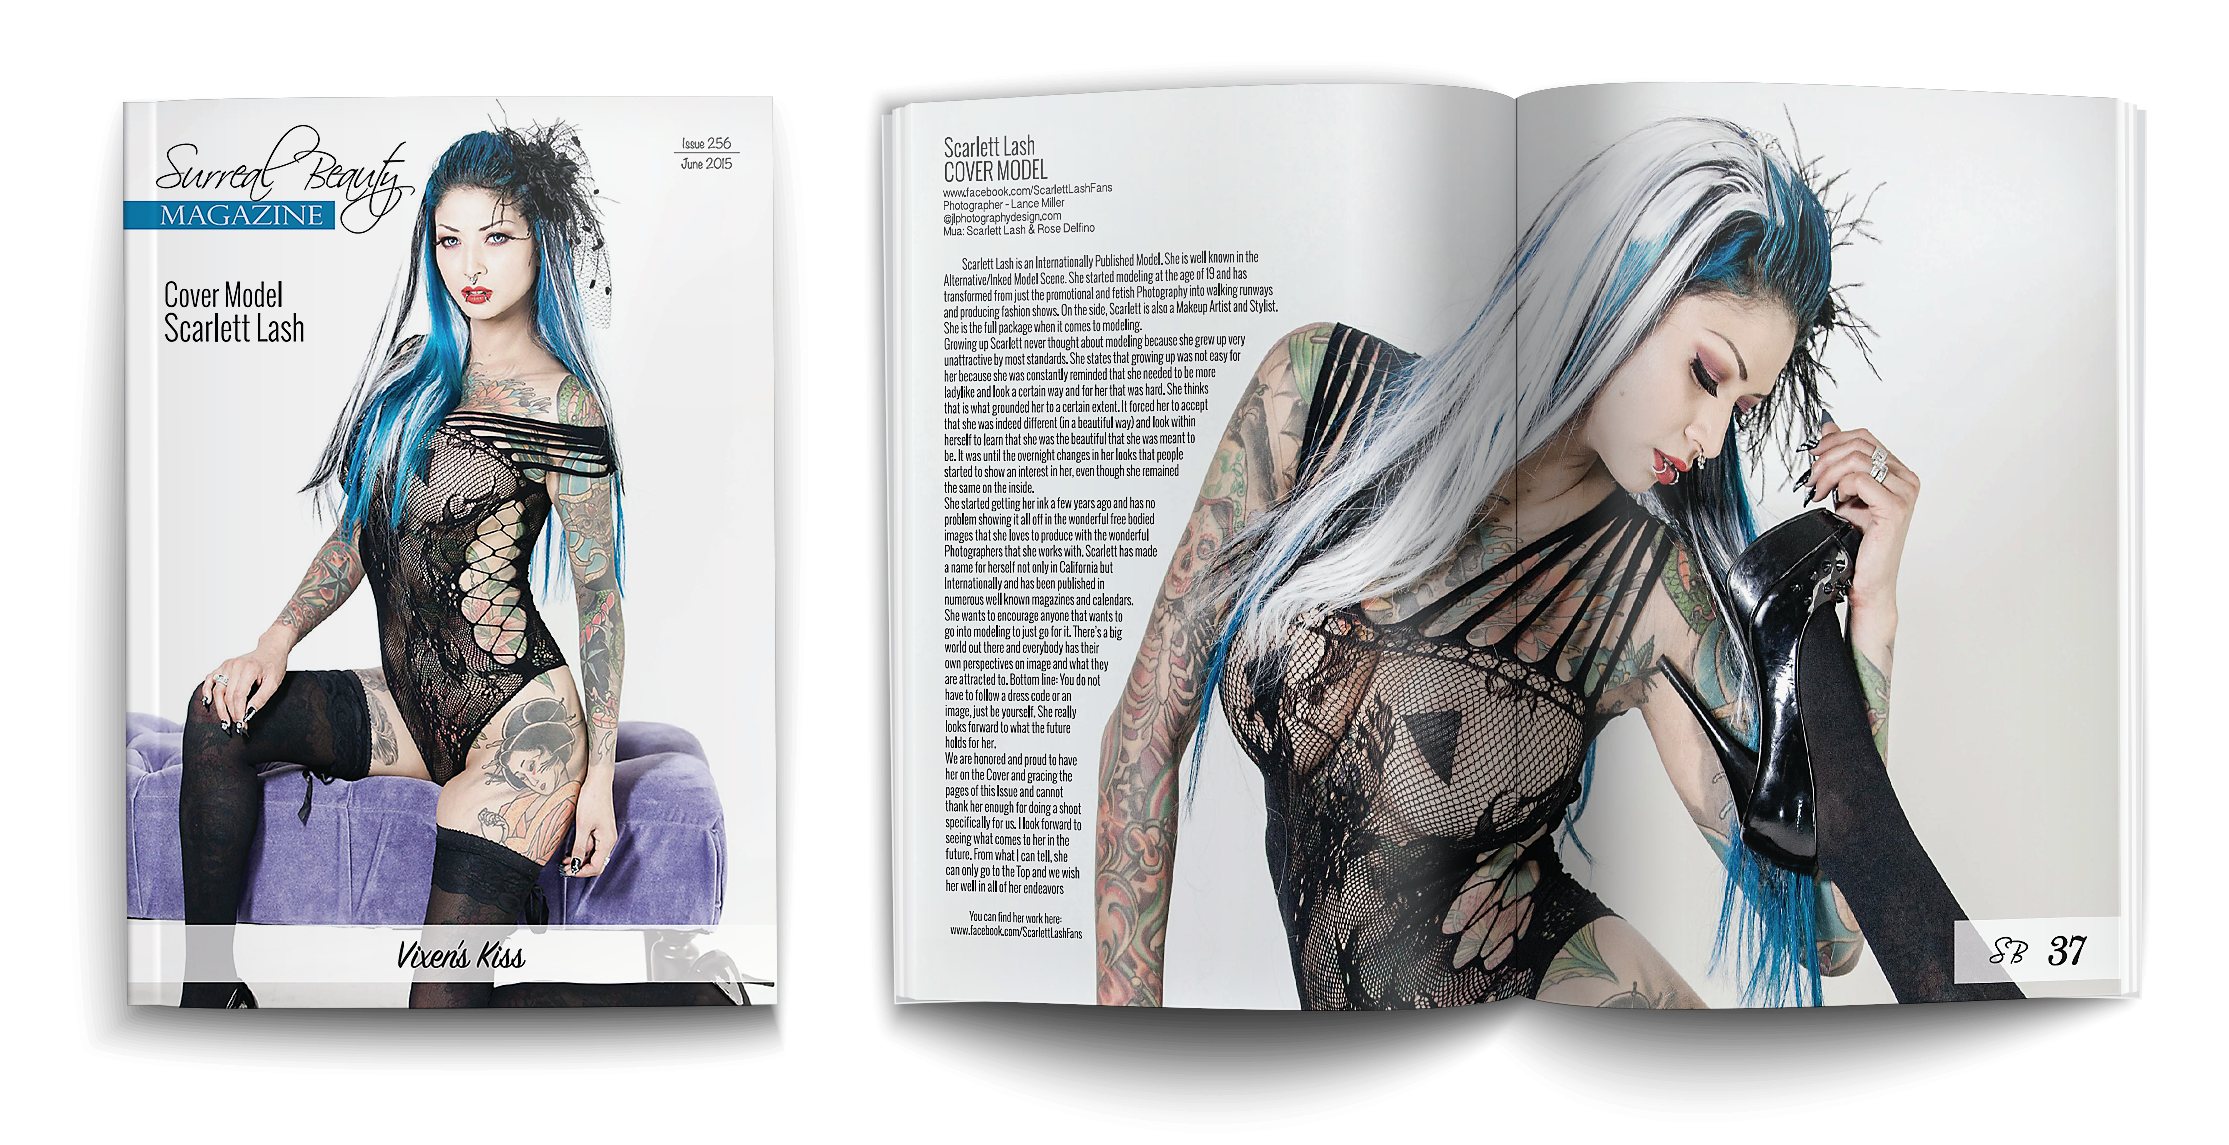 Surreal_Beauty_Magazine_Vixen_s_Kiss_Render4.png